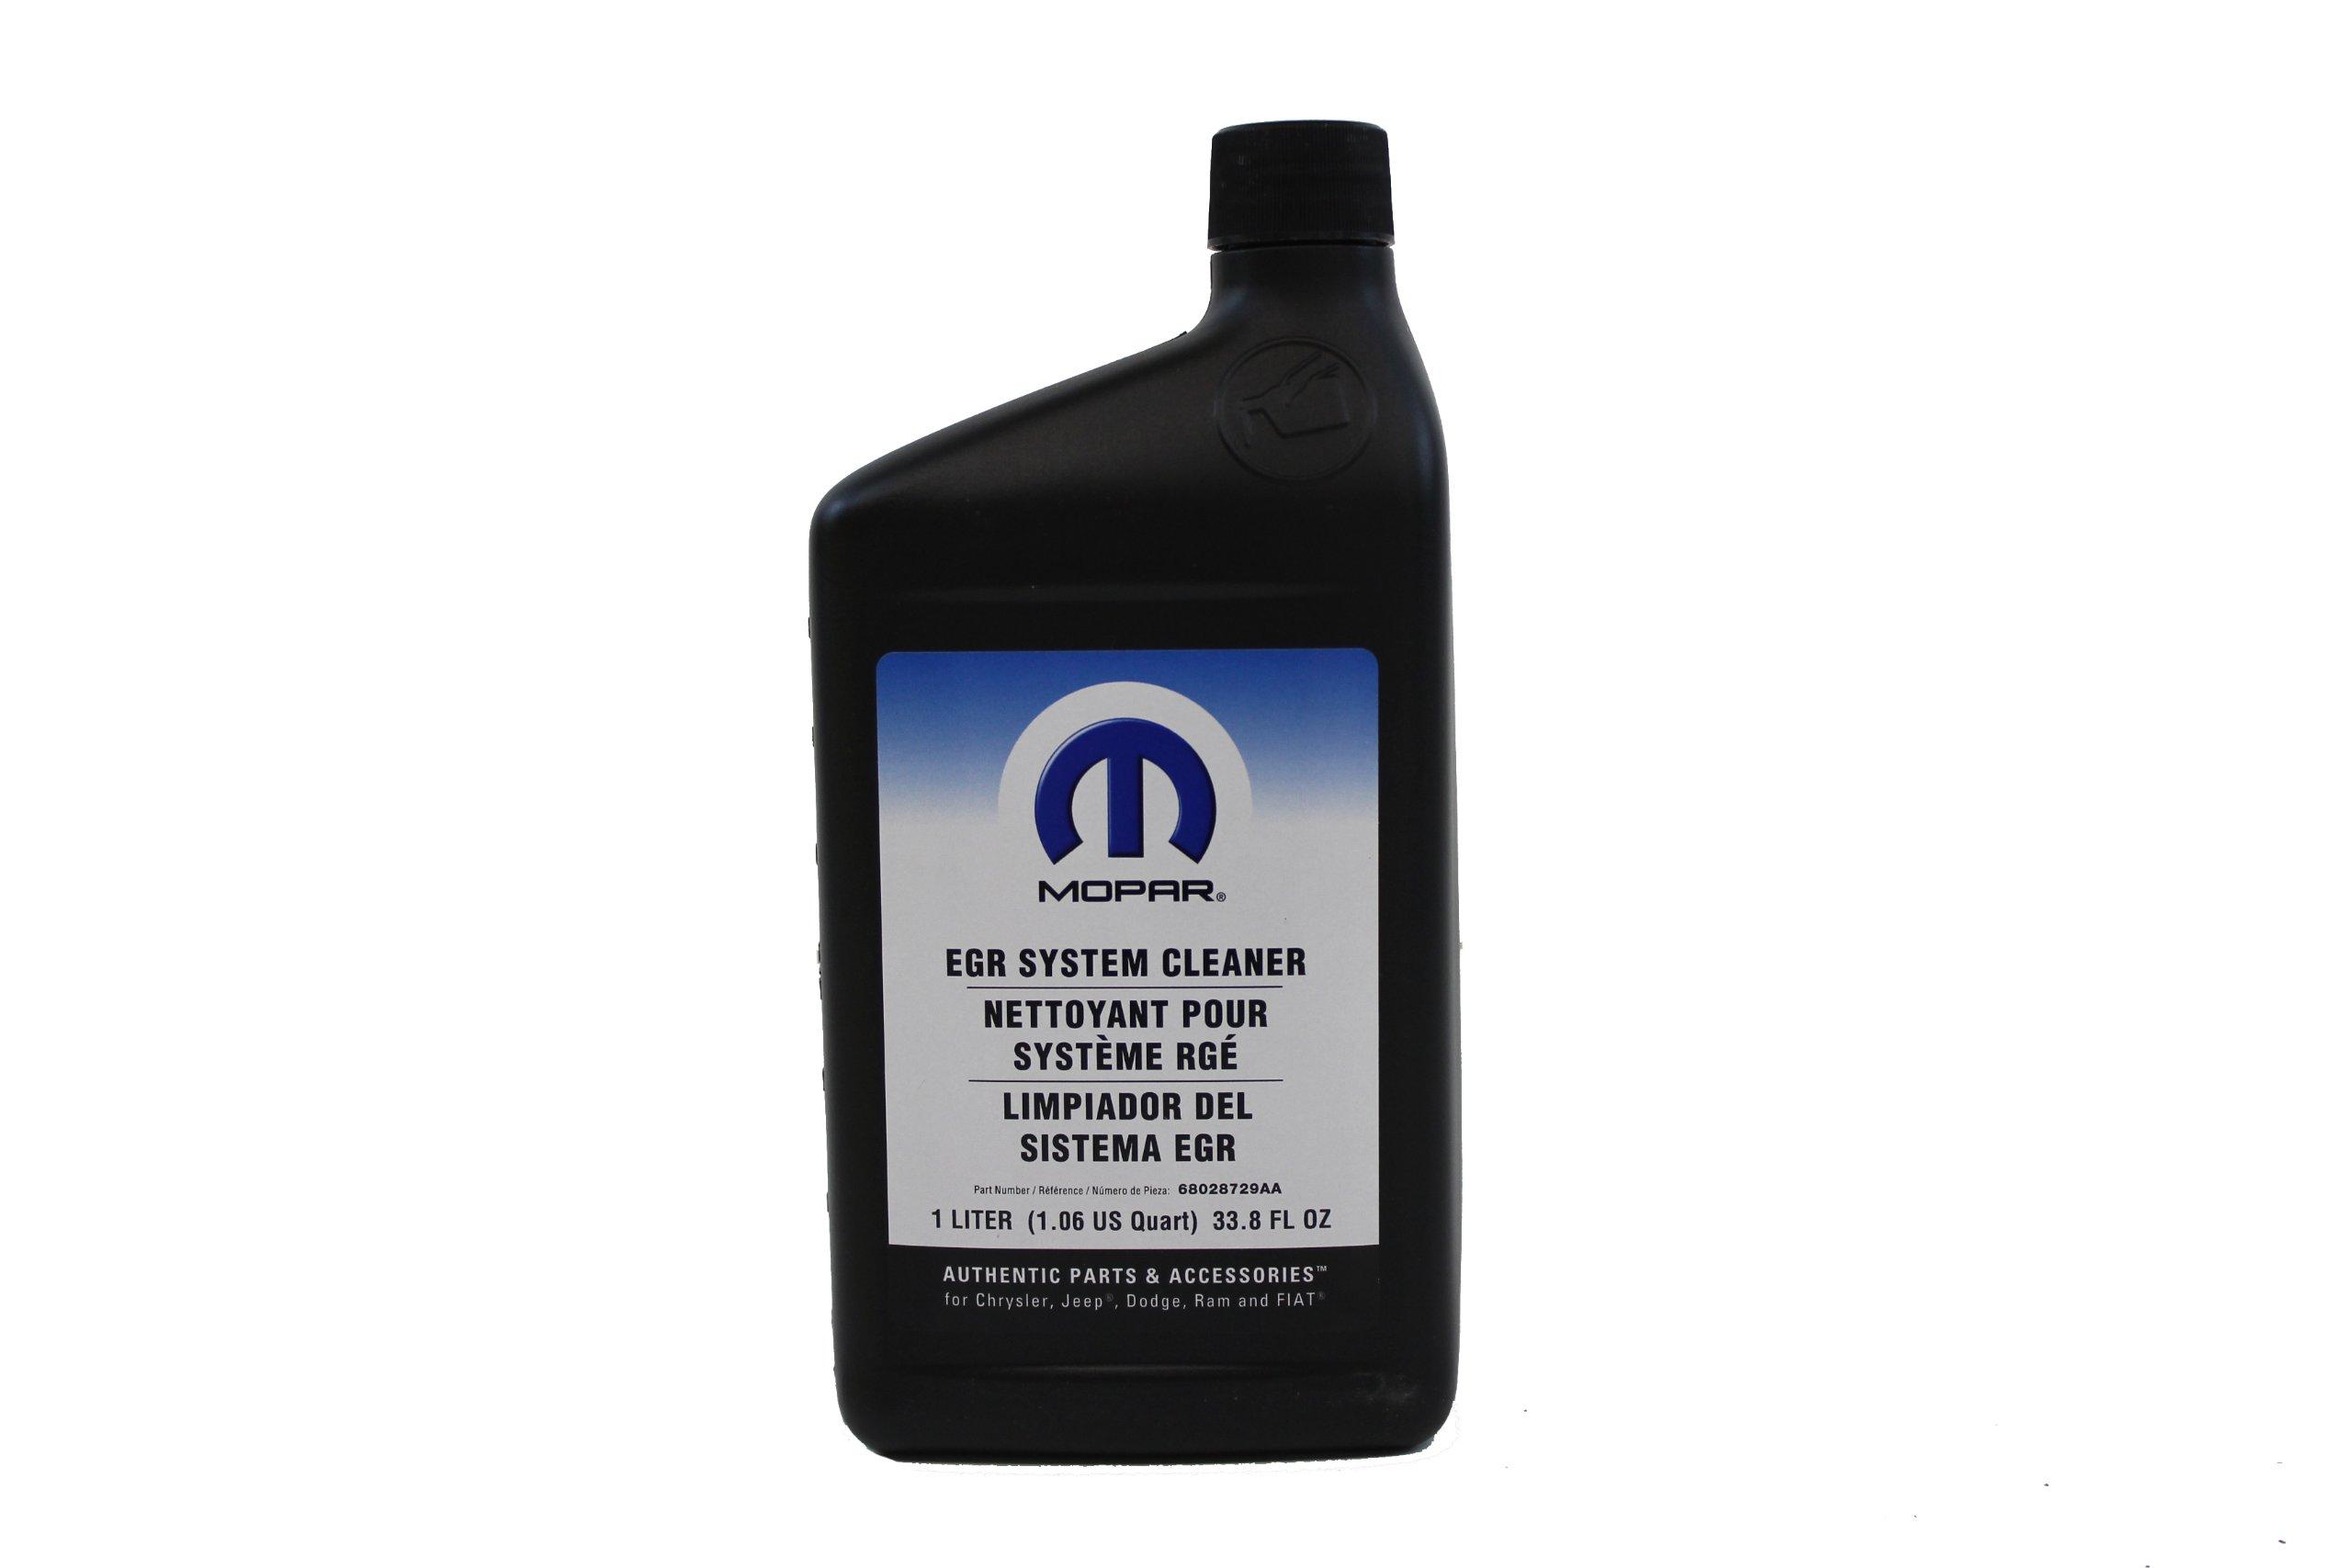 Chrysler Genuine Accessories 68028729AB EGR System Cleaner - 1 Liter